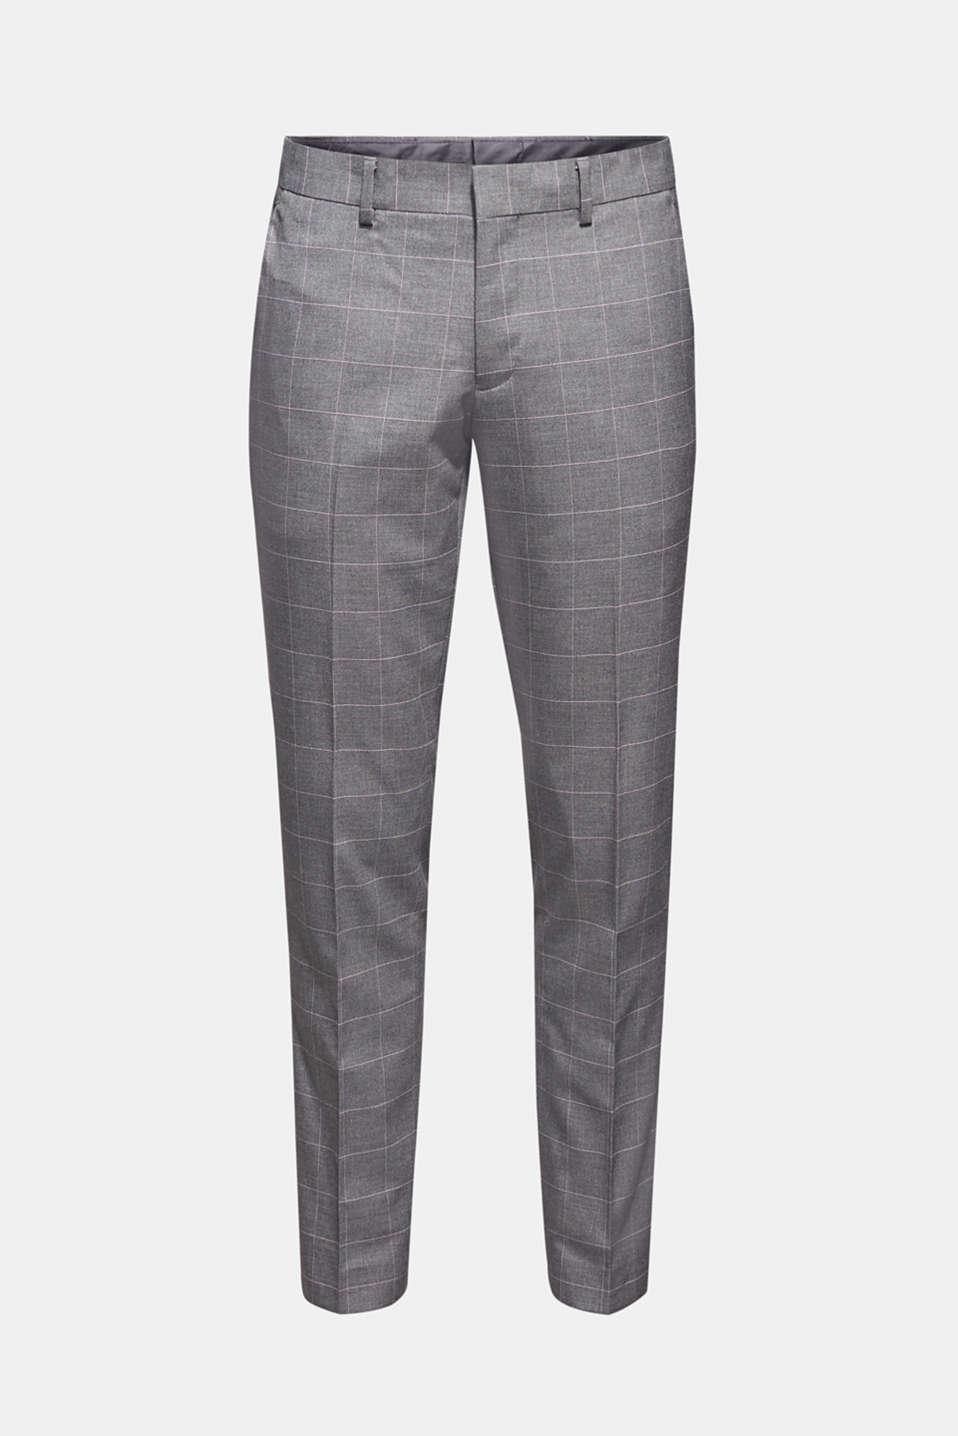 Pants suit, GREY, detail image number 6